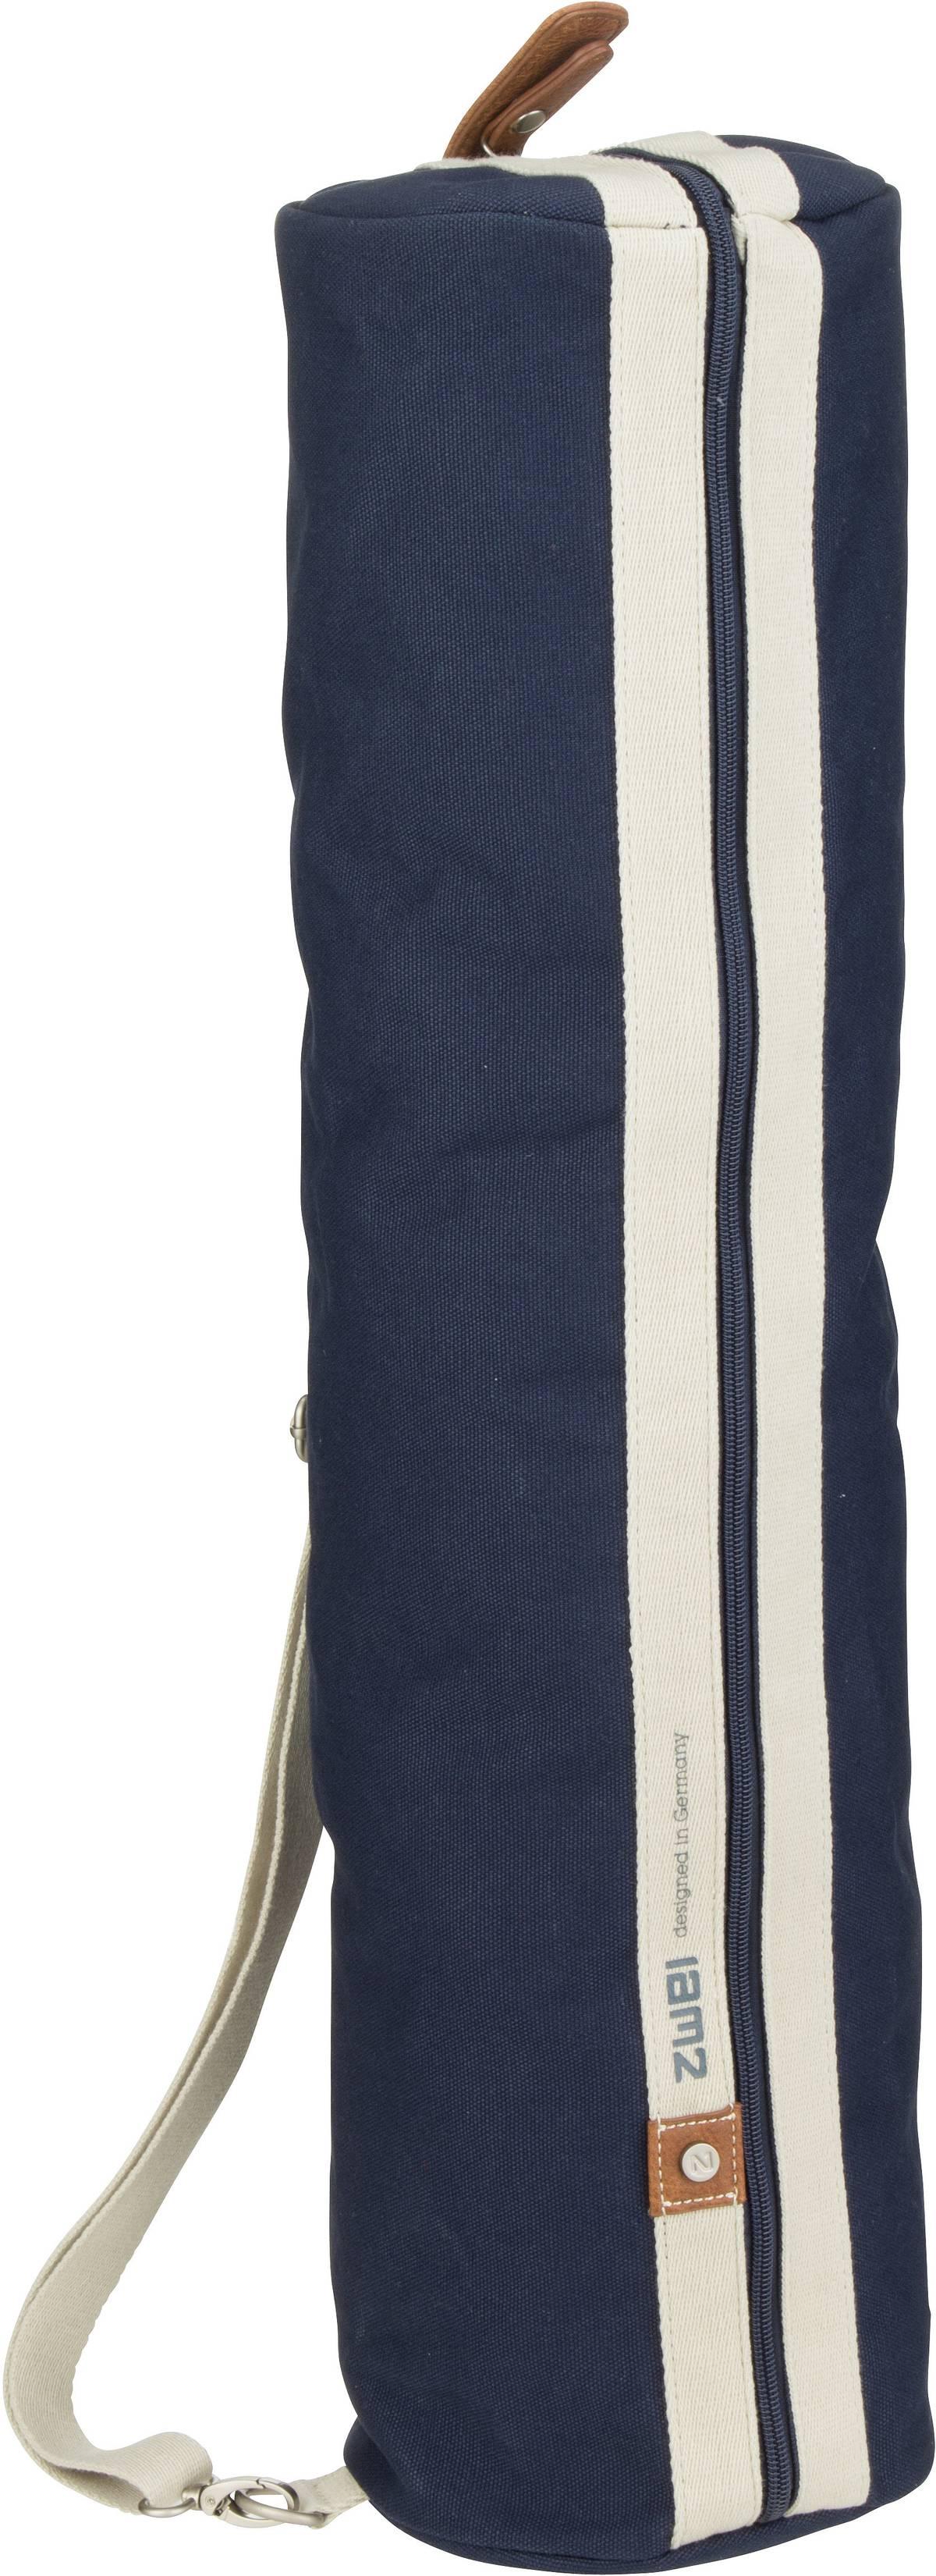 Rucksack / Daypack Yoga Y108 Blue (13 Liter)